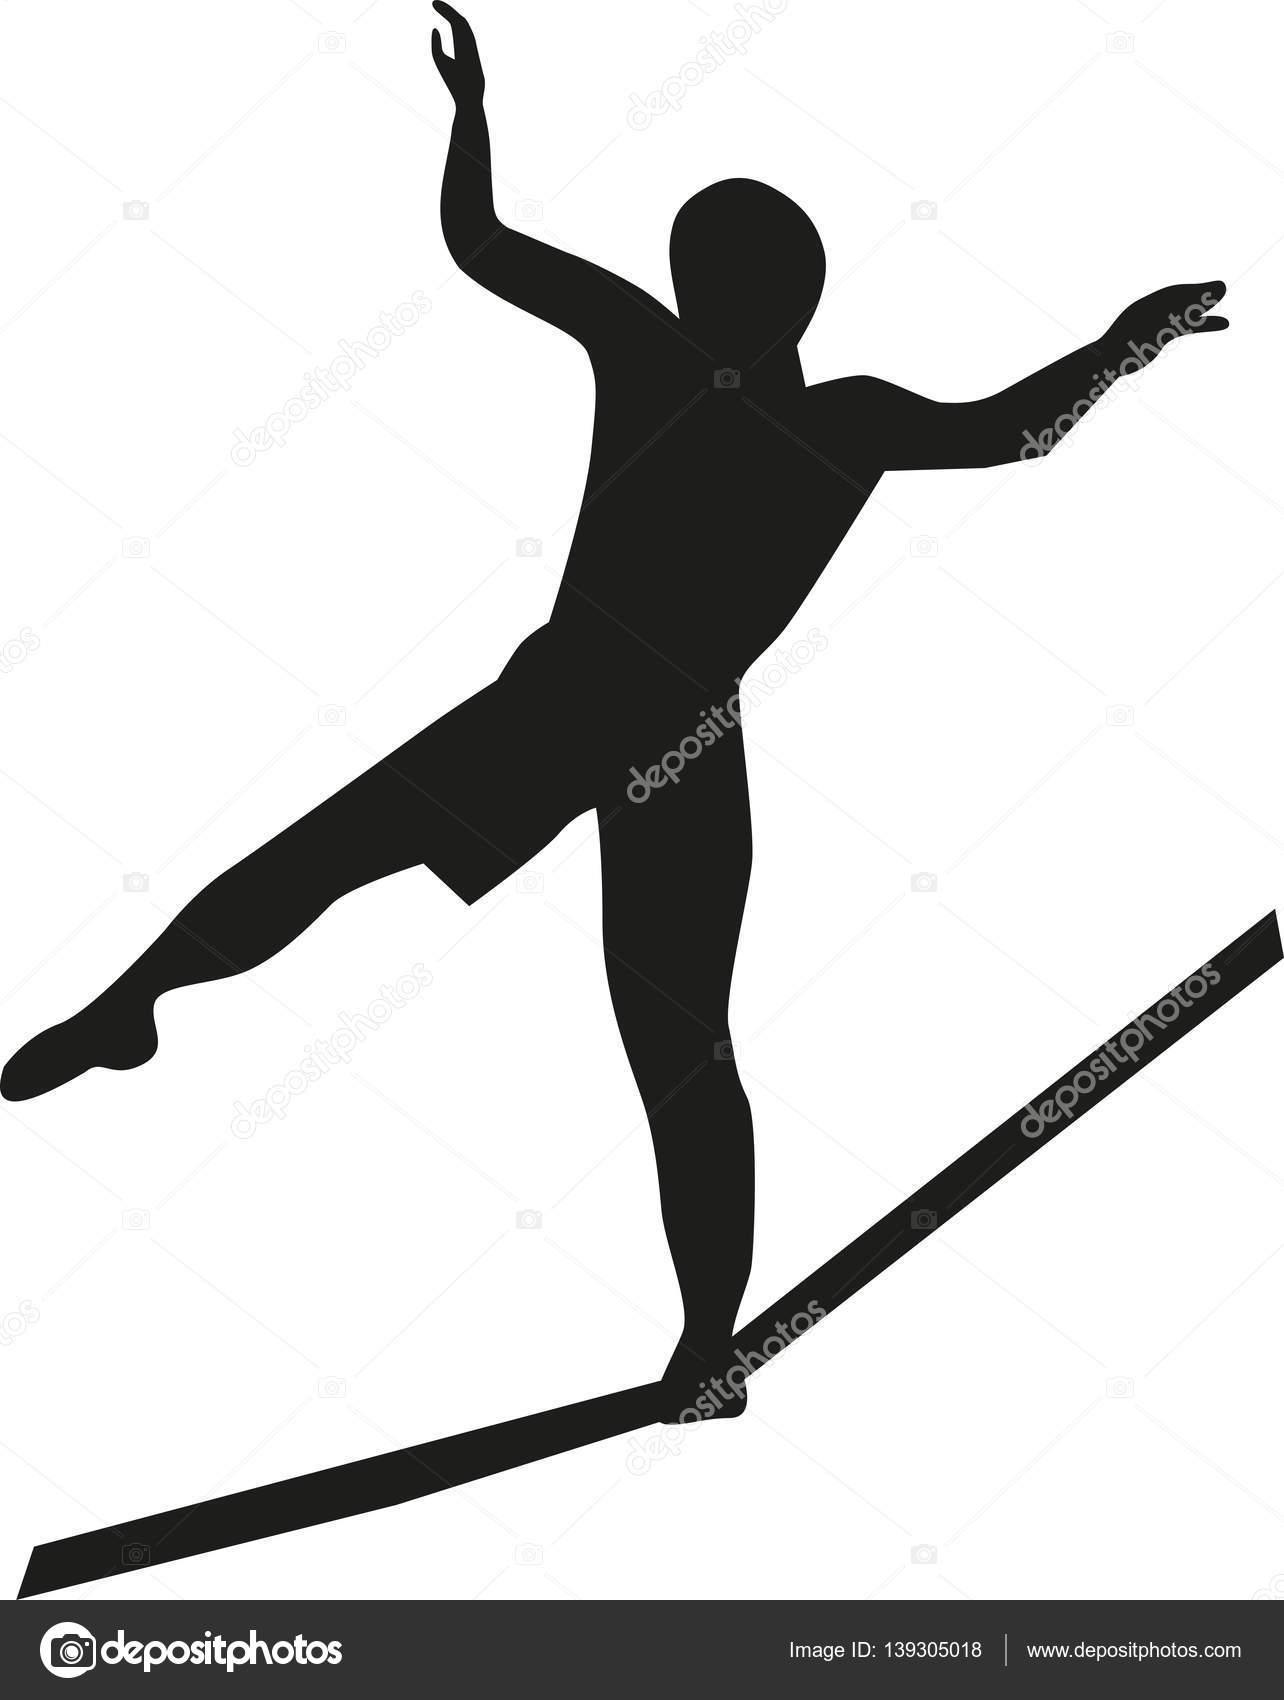 Slackline silhouette vector — Stock Vector © miceking #139305018